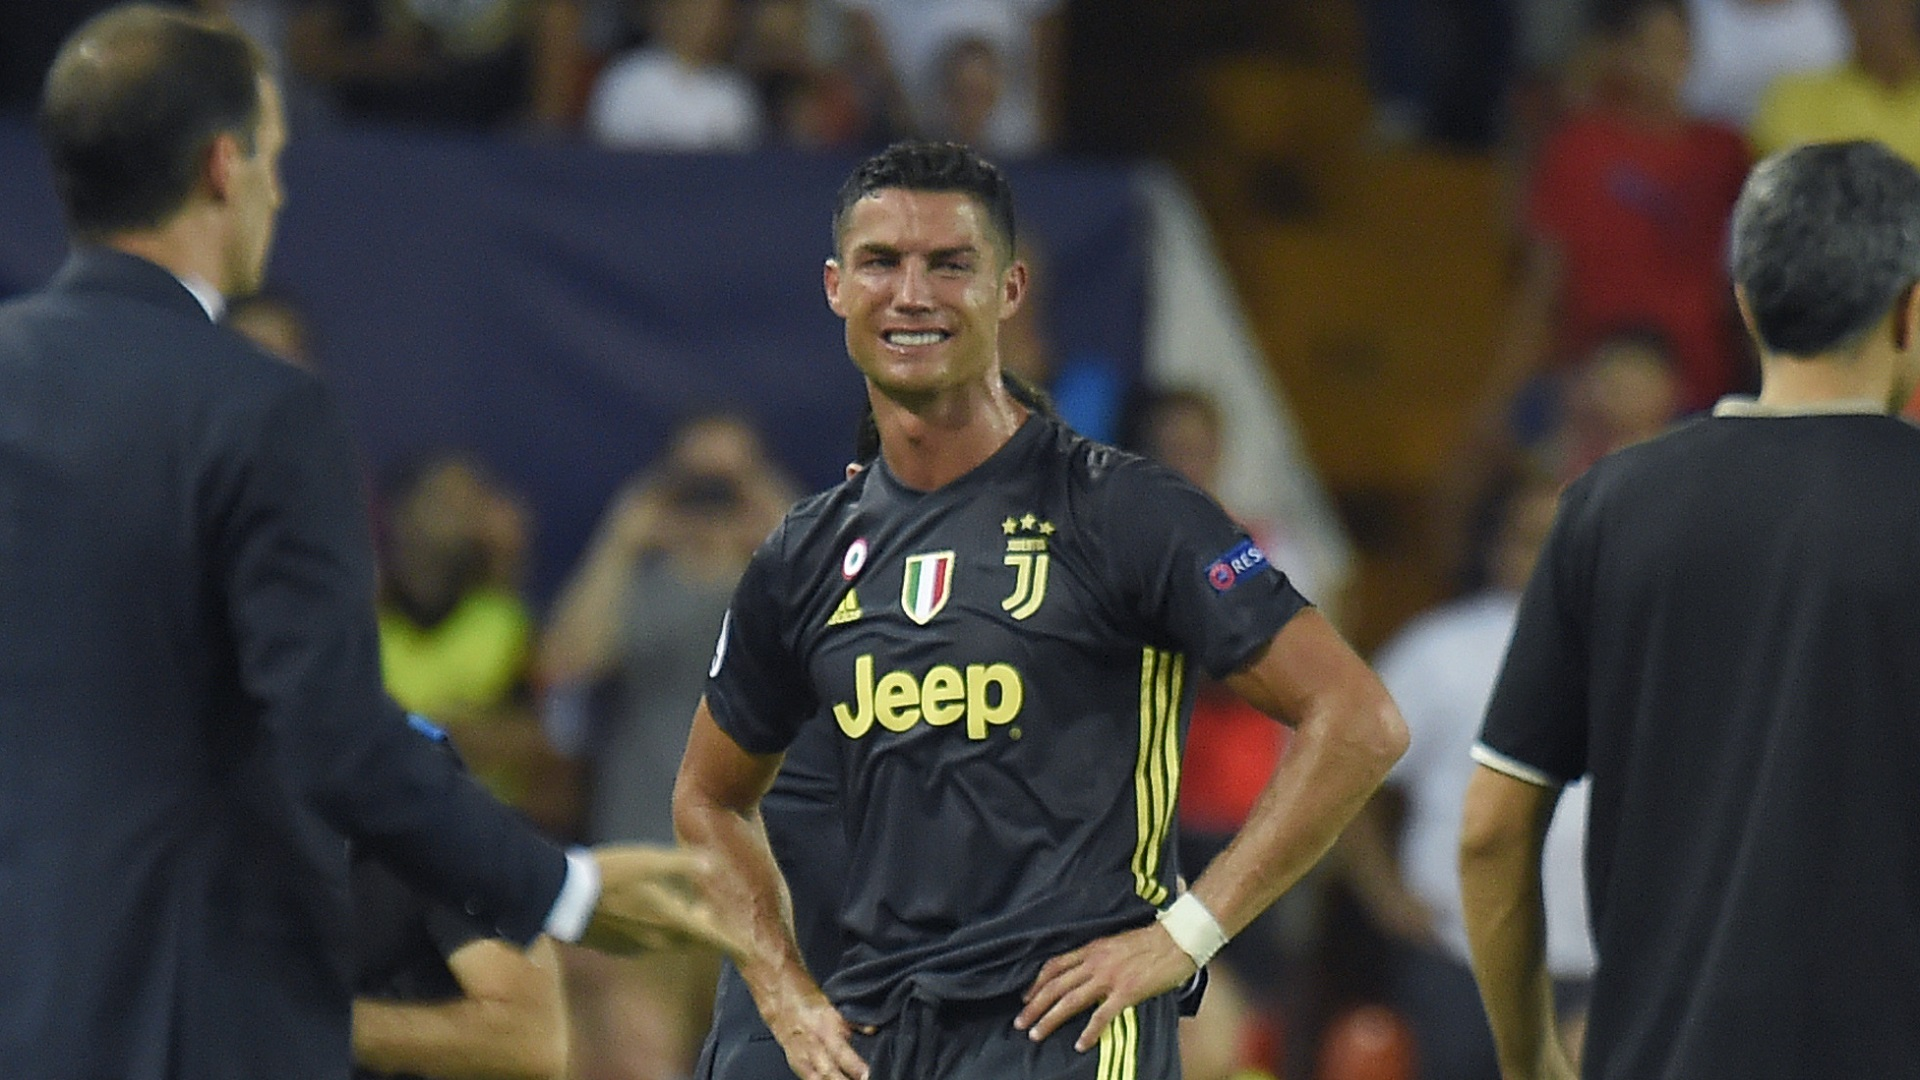 rote karte ronaldo Cristiano Ronaldo sieht beim Champions League Debüt für Juventus